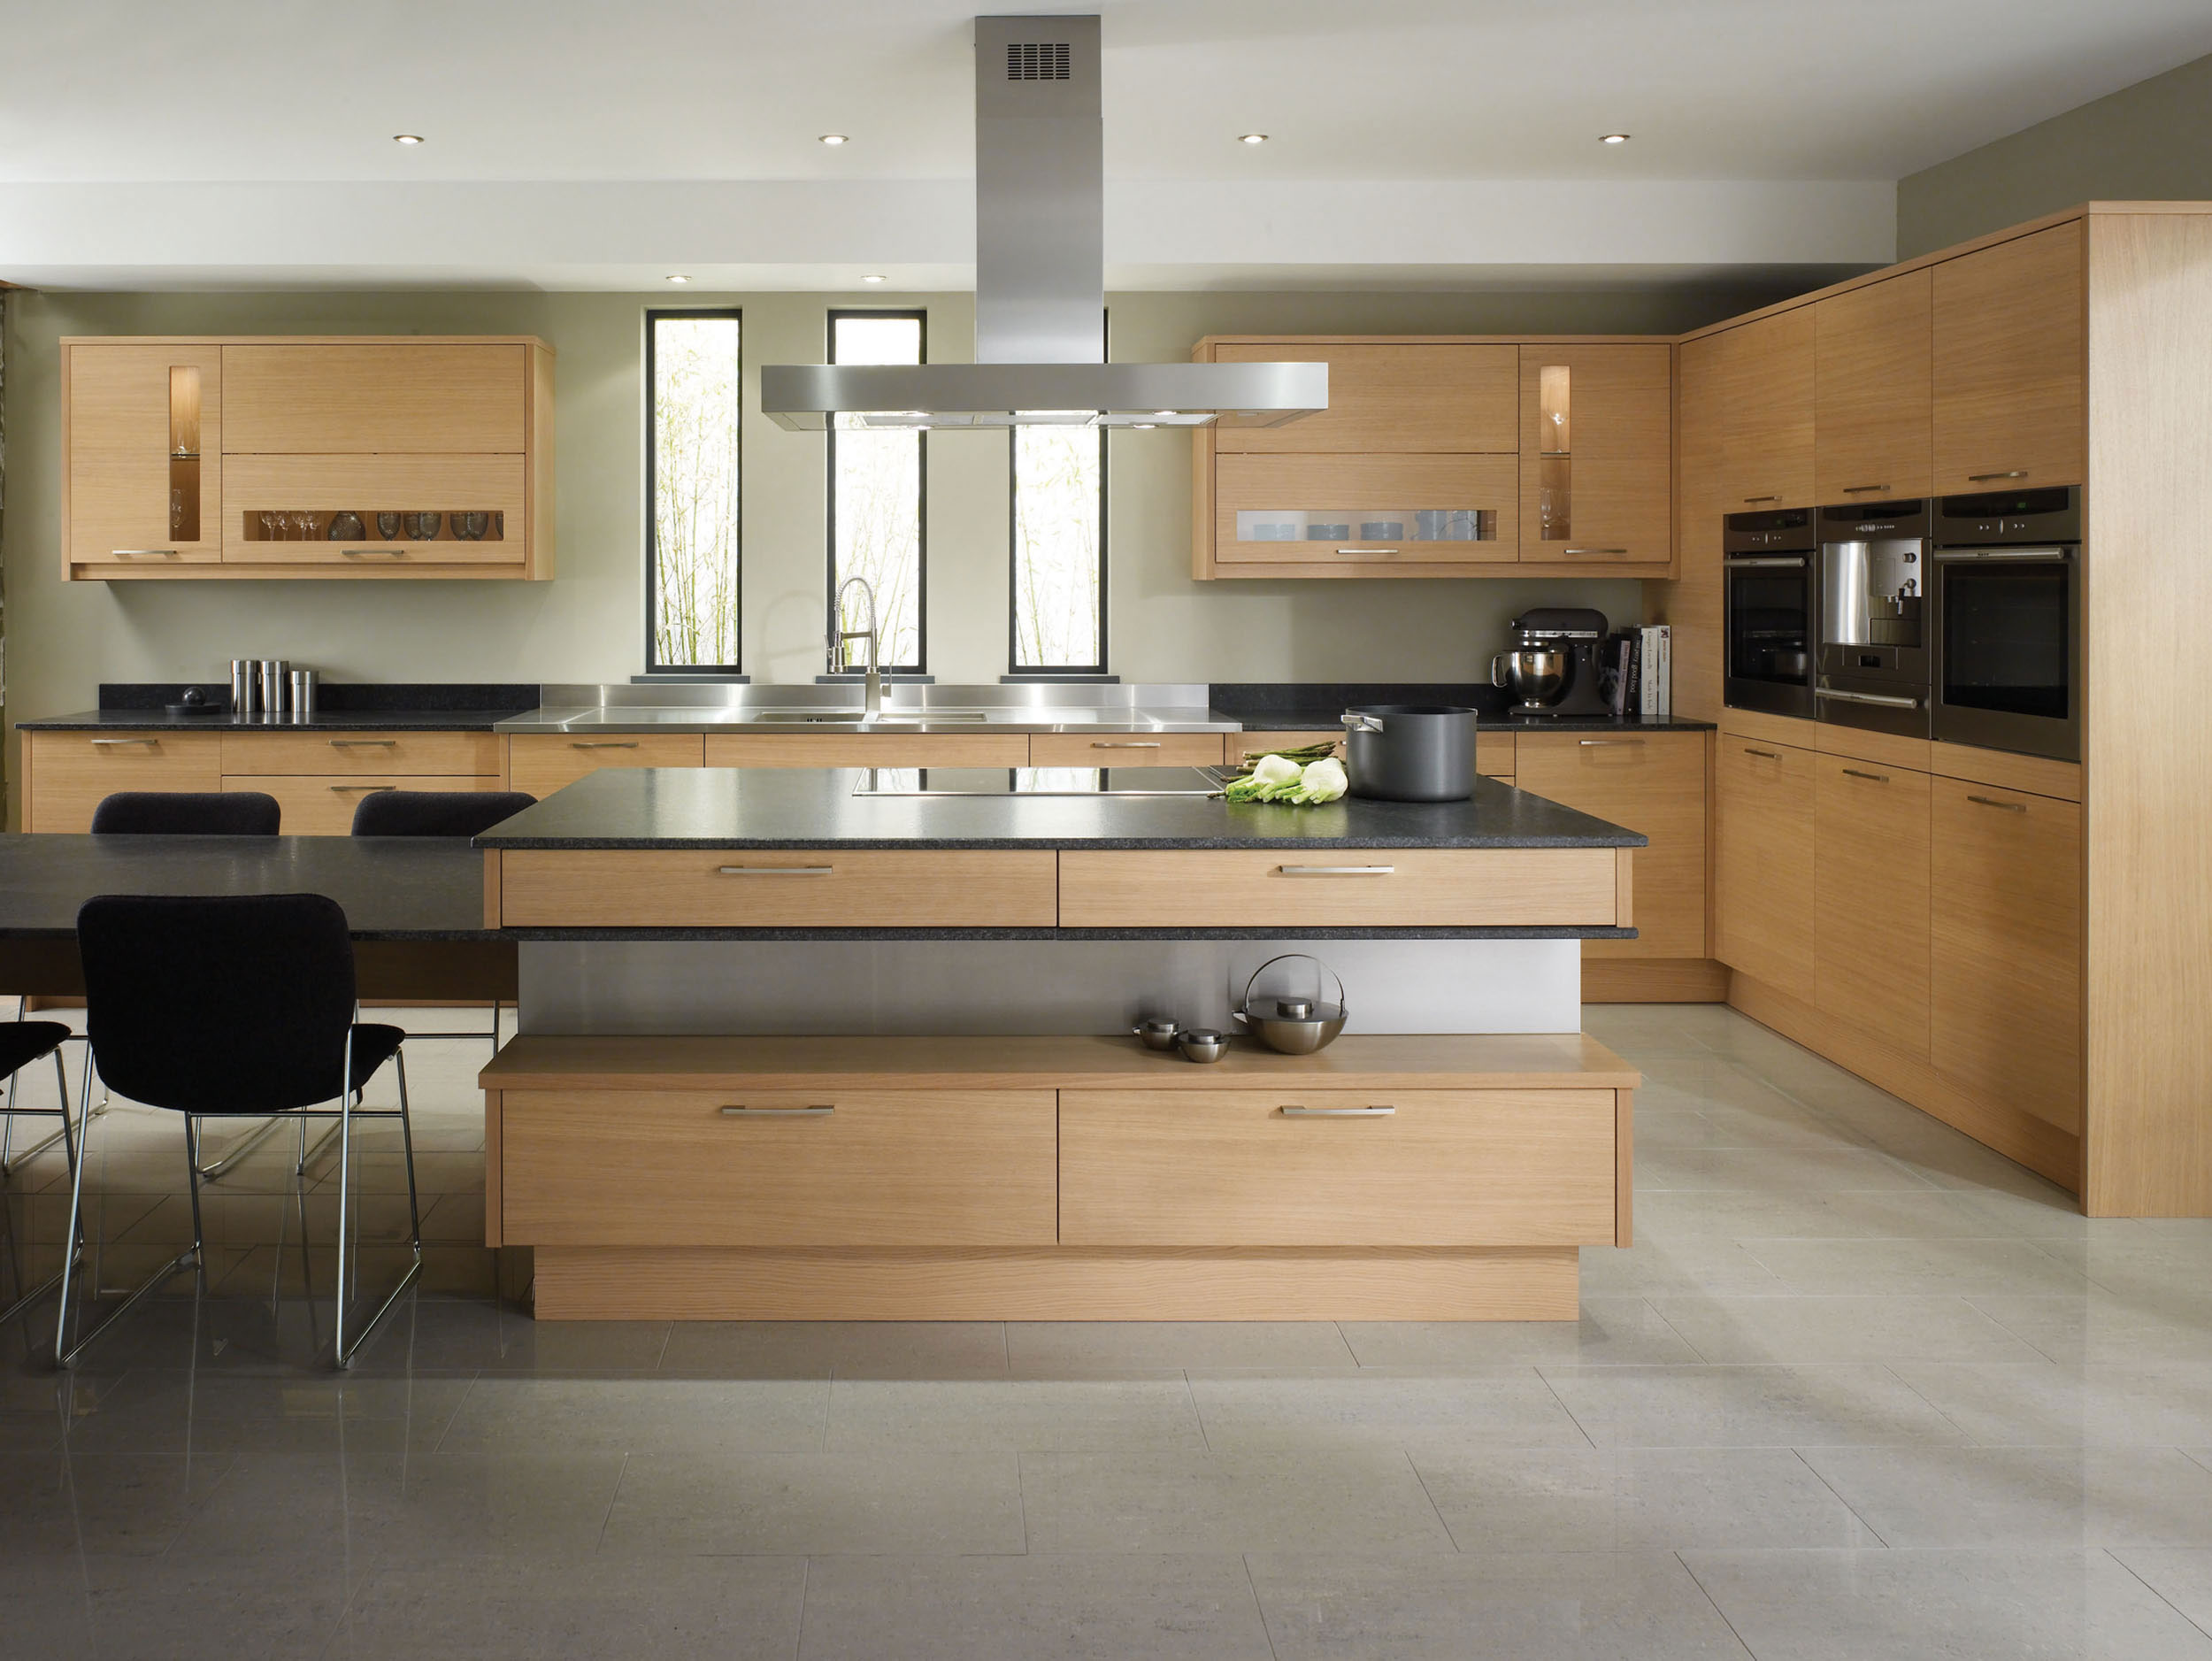 modern remodel kitchen ideas and modern kitchen remodeling ideas ILHGRUW